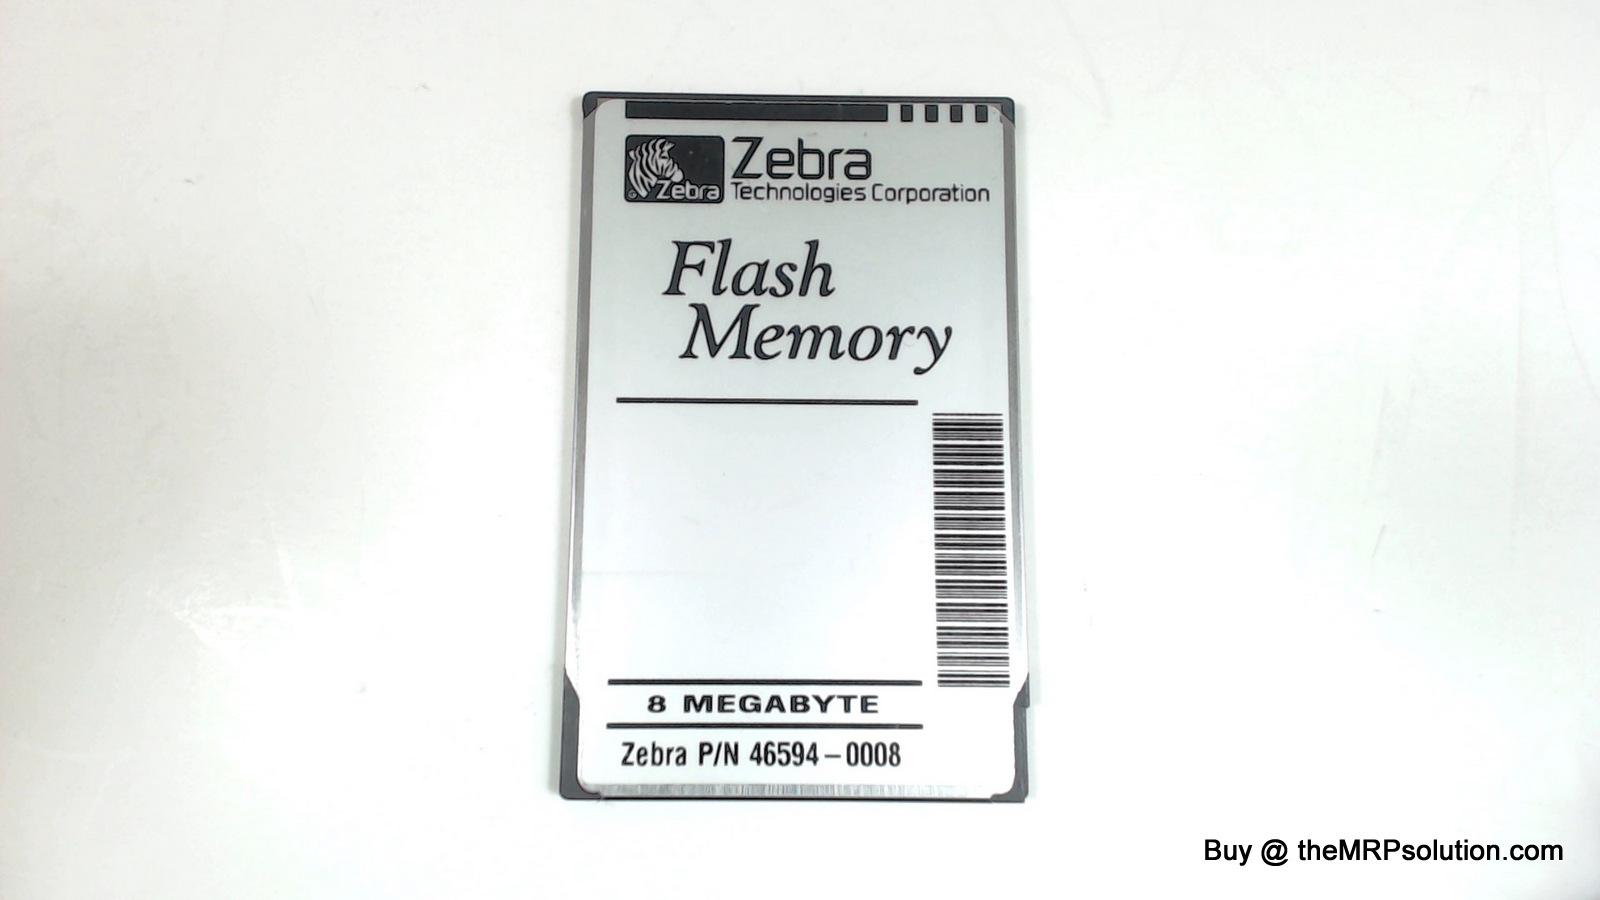 ZEBRA 46594 PWB, 2MB FLASH MEMORY Refurbished